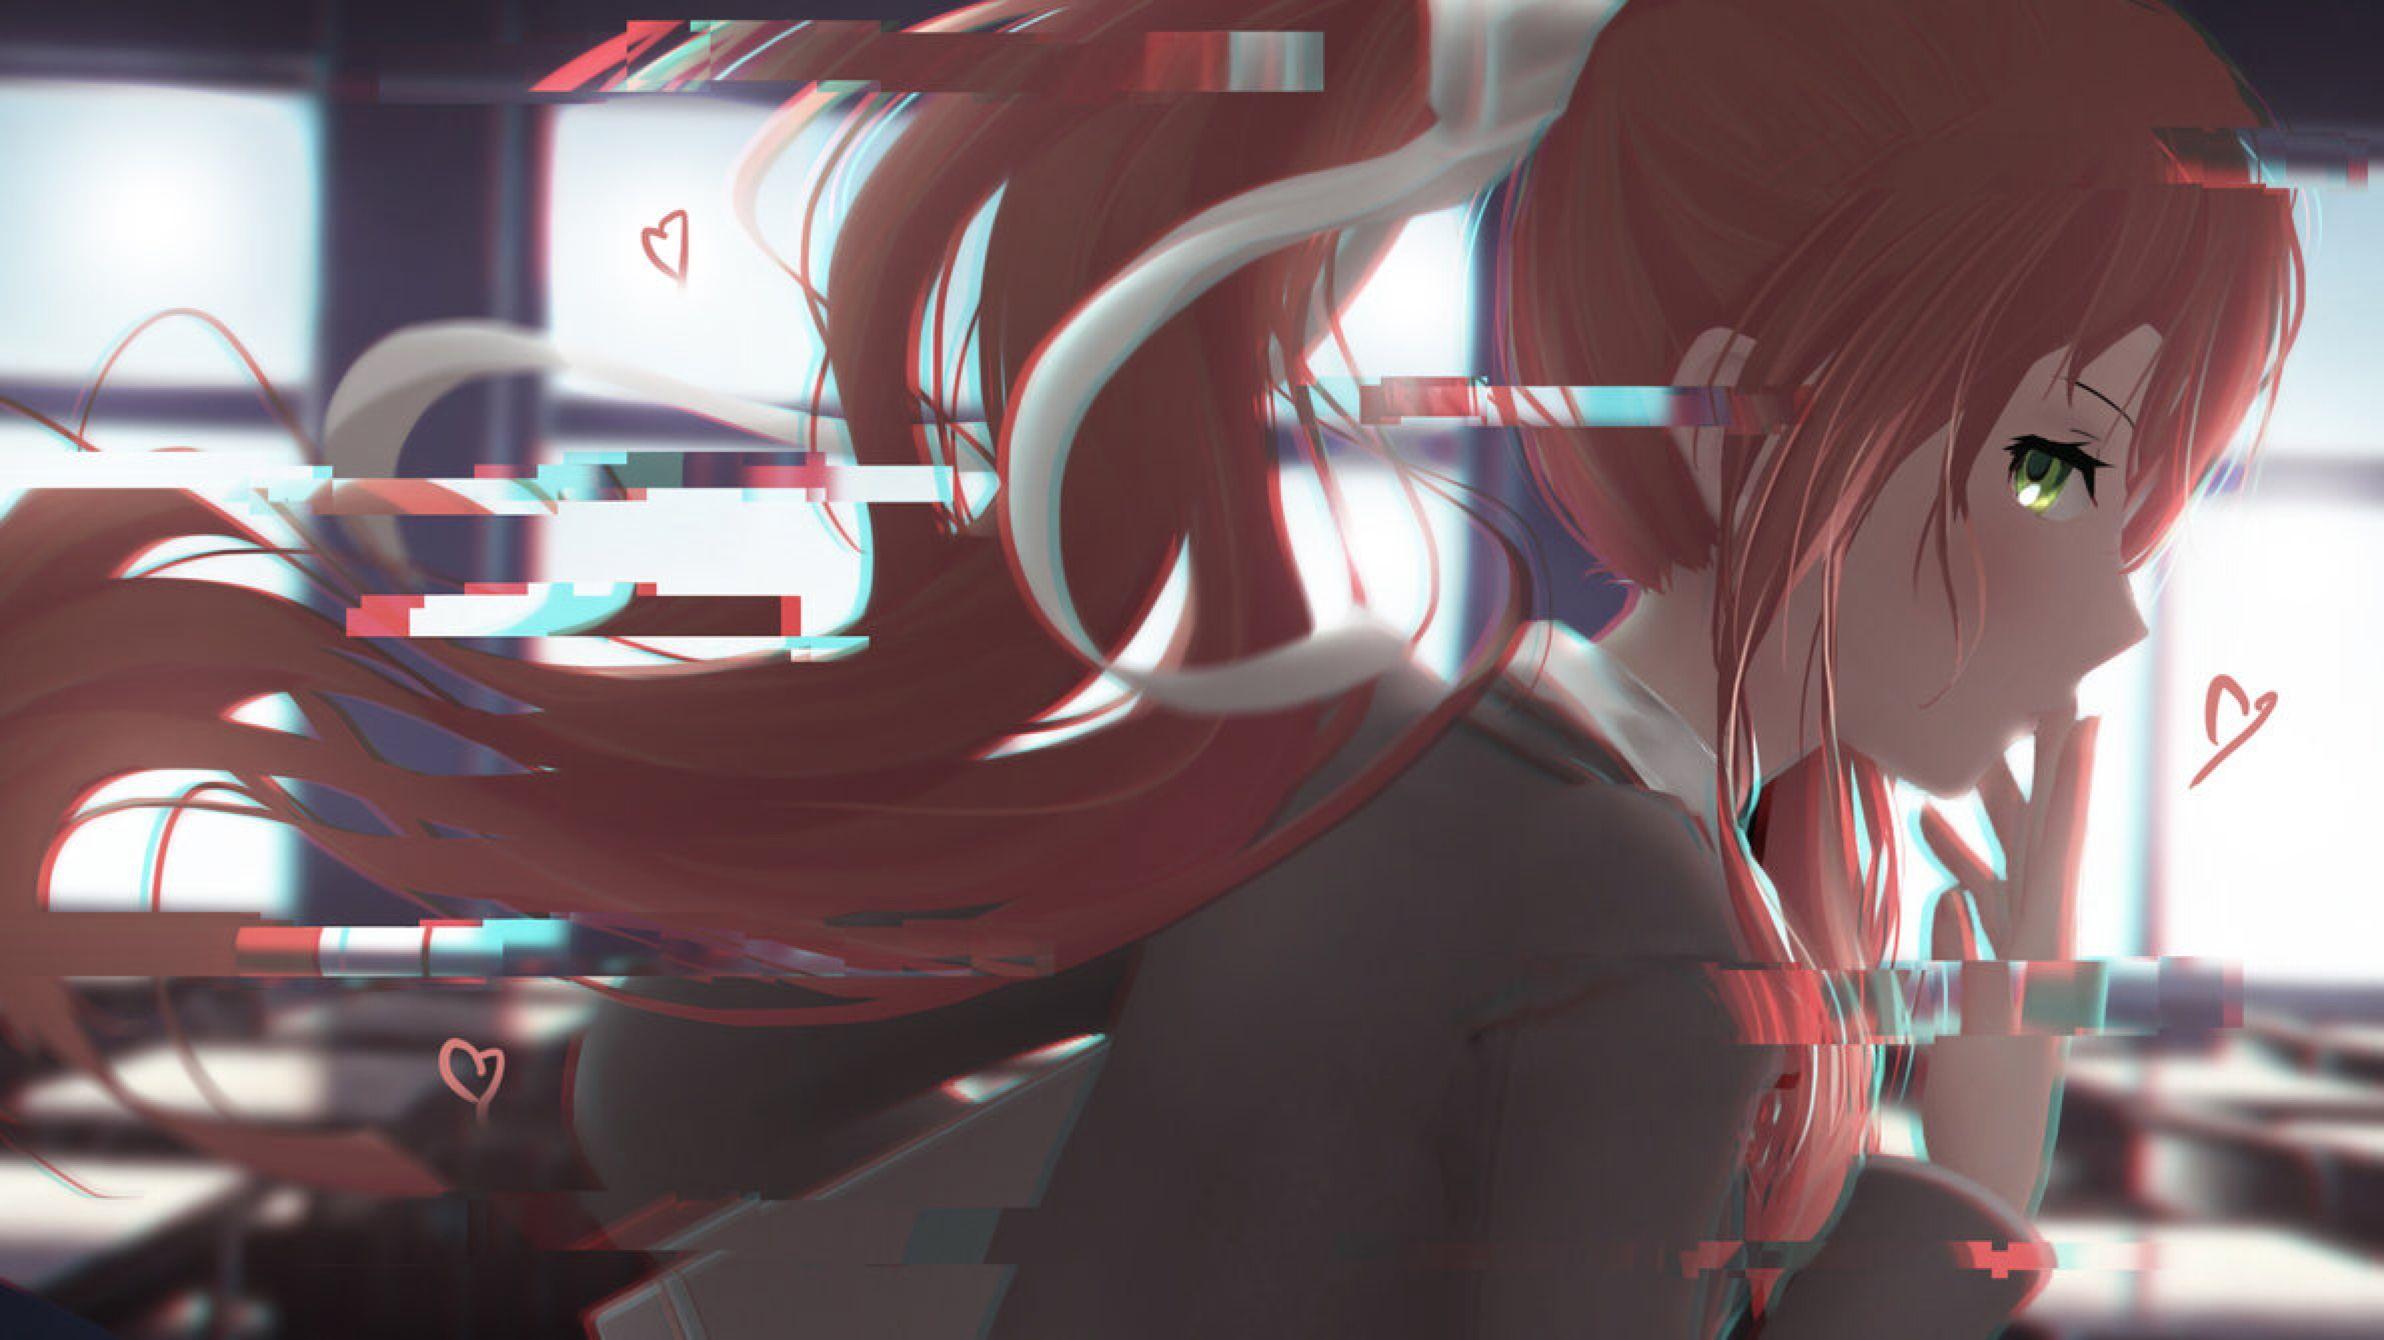 Just Monika By Sculp2 On Deviantart Literature Club Aesthetic Anime Literature